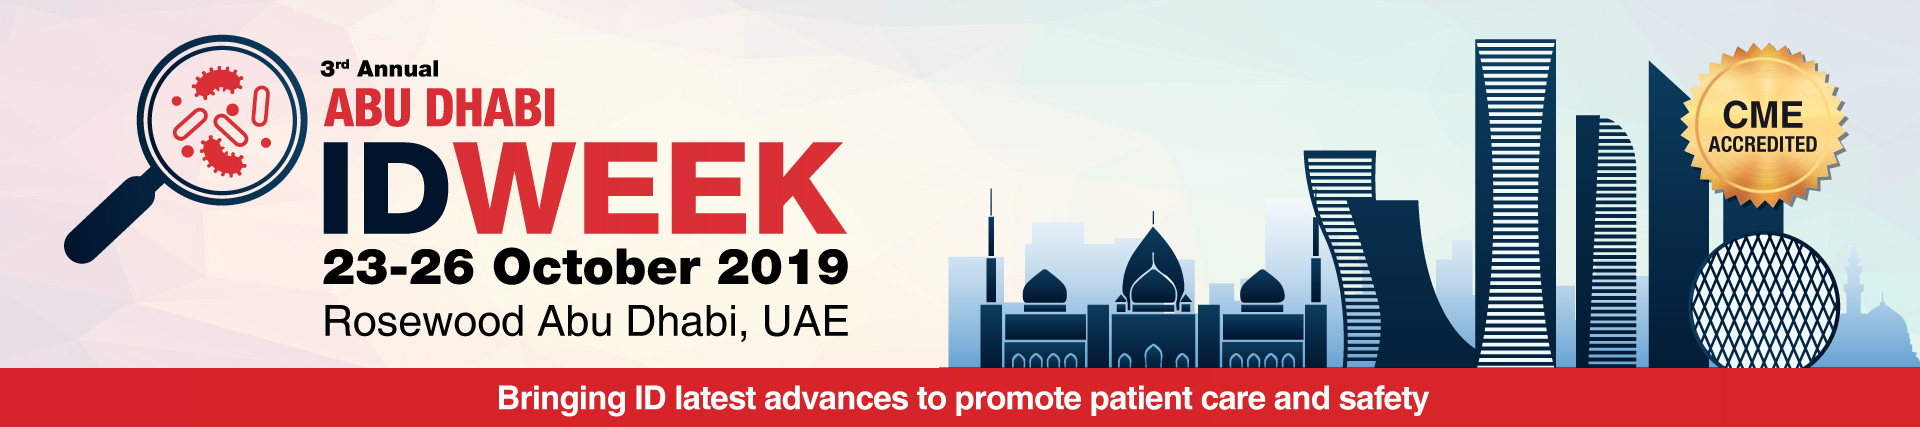 The 3rd Annual Abu Dhabi i ID Week Abstract